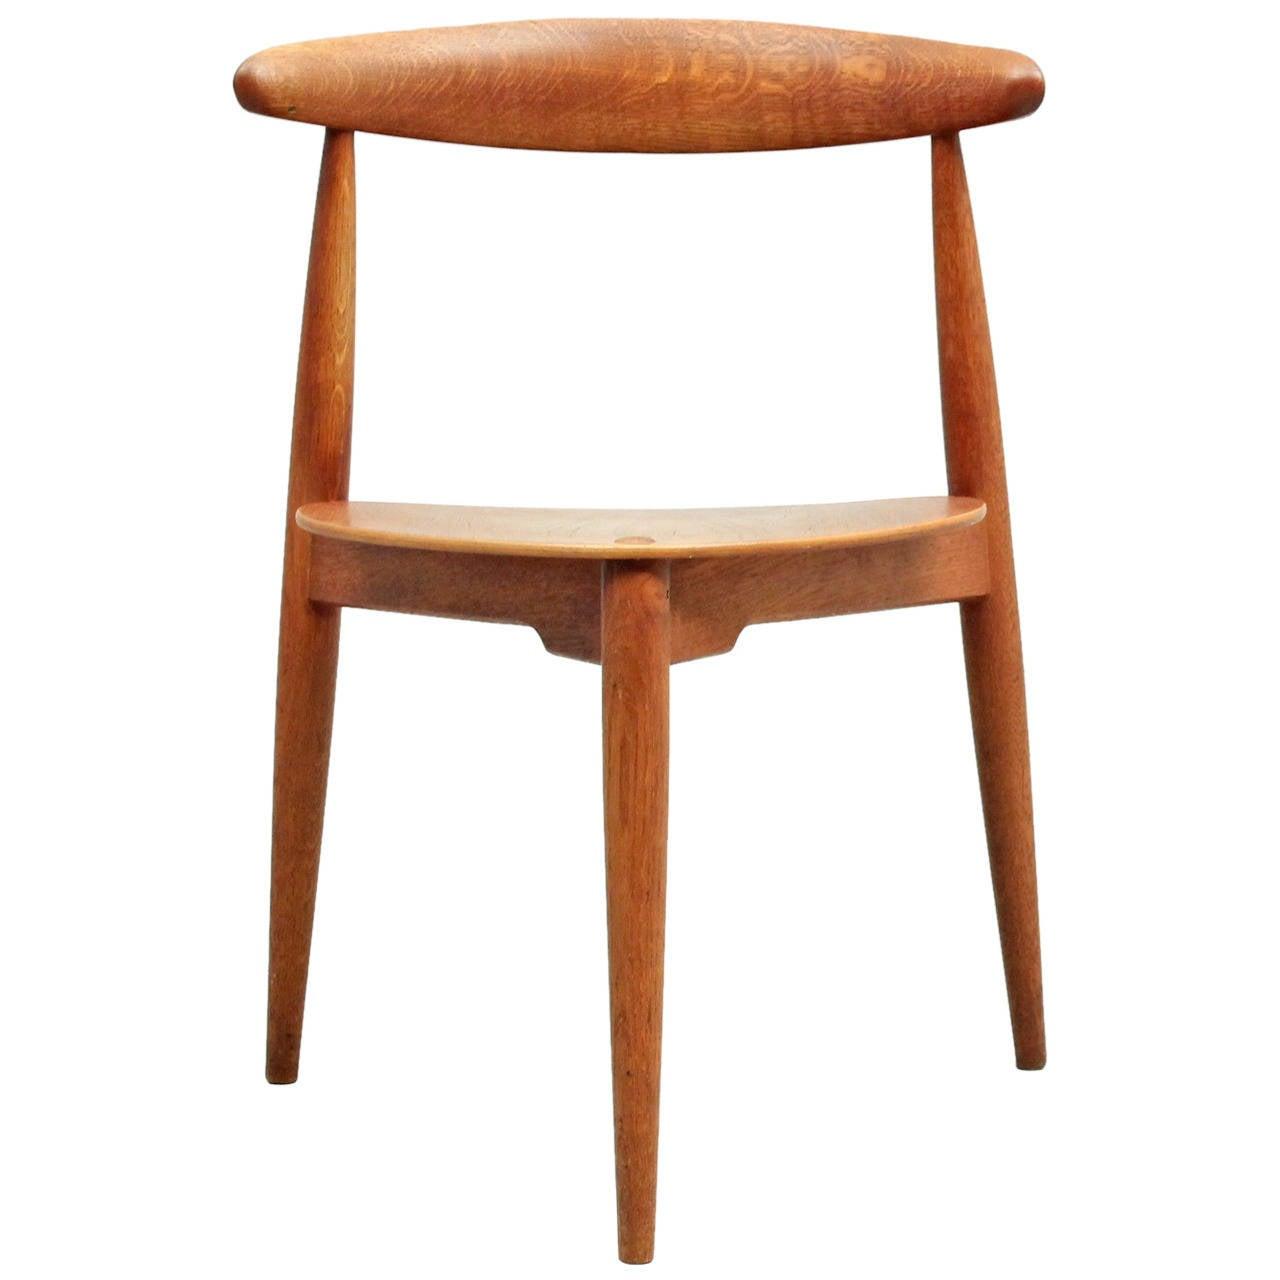 hans wegner heart chair at 1stdibs. Black Bedroom Furniture Sets. Home Design Ideas